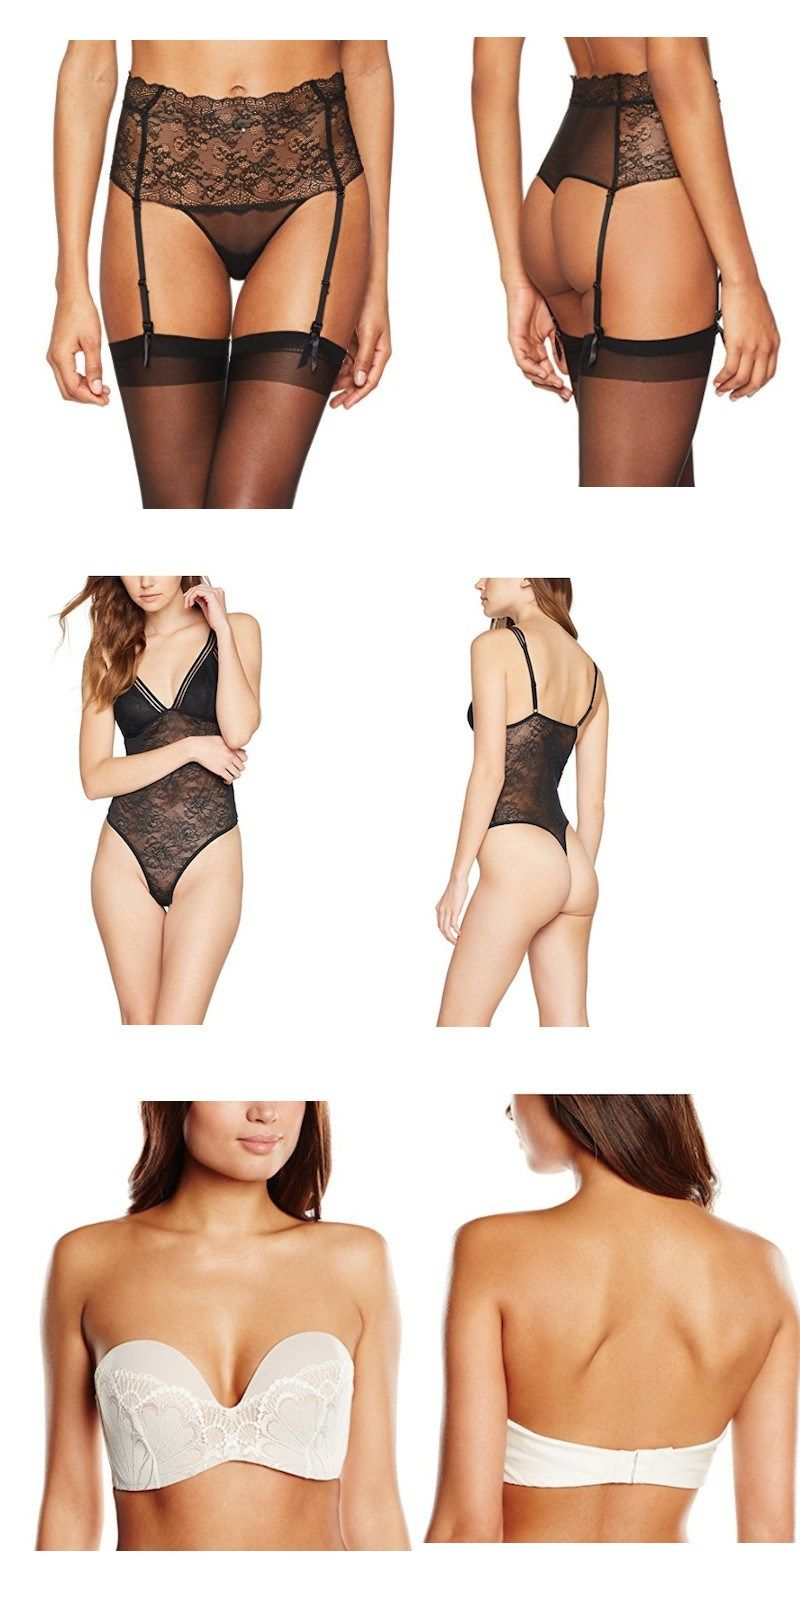 40bc81d1d9 Moda   Lencería y ropa interior para mujer. Lencería ropa interior mujer.  Iris Lilly